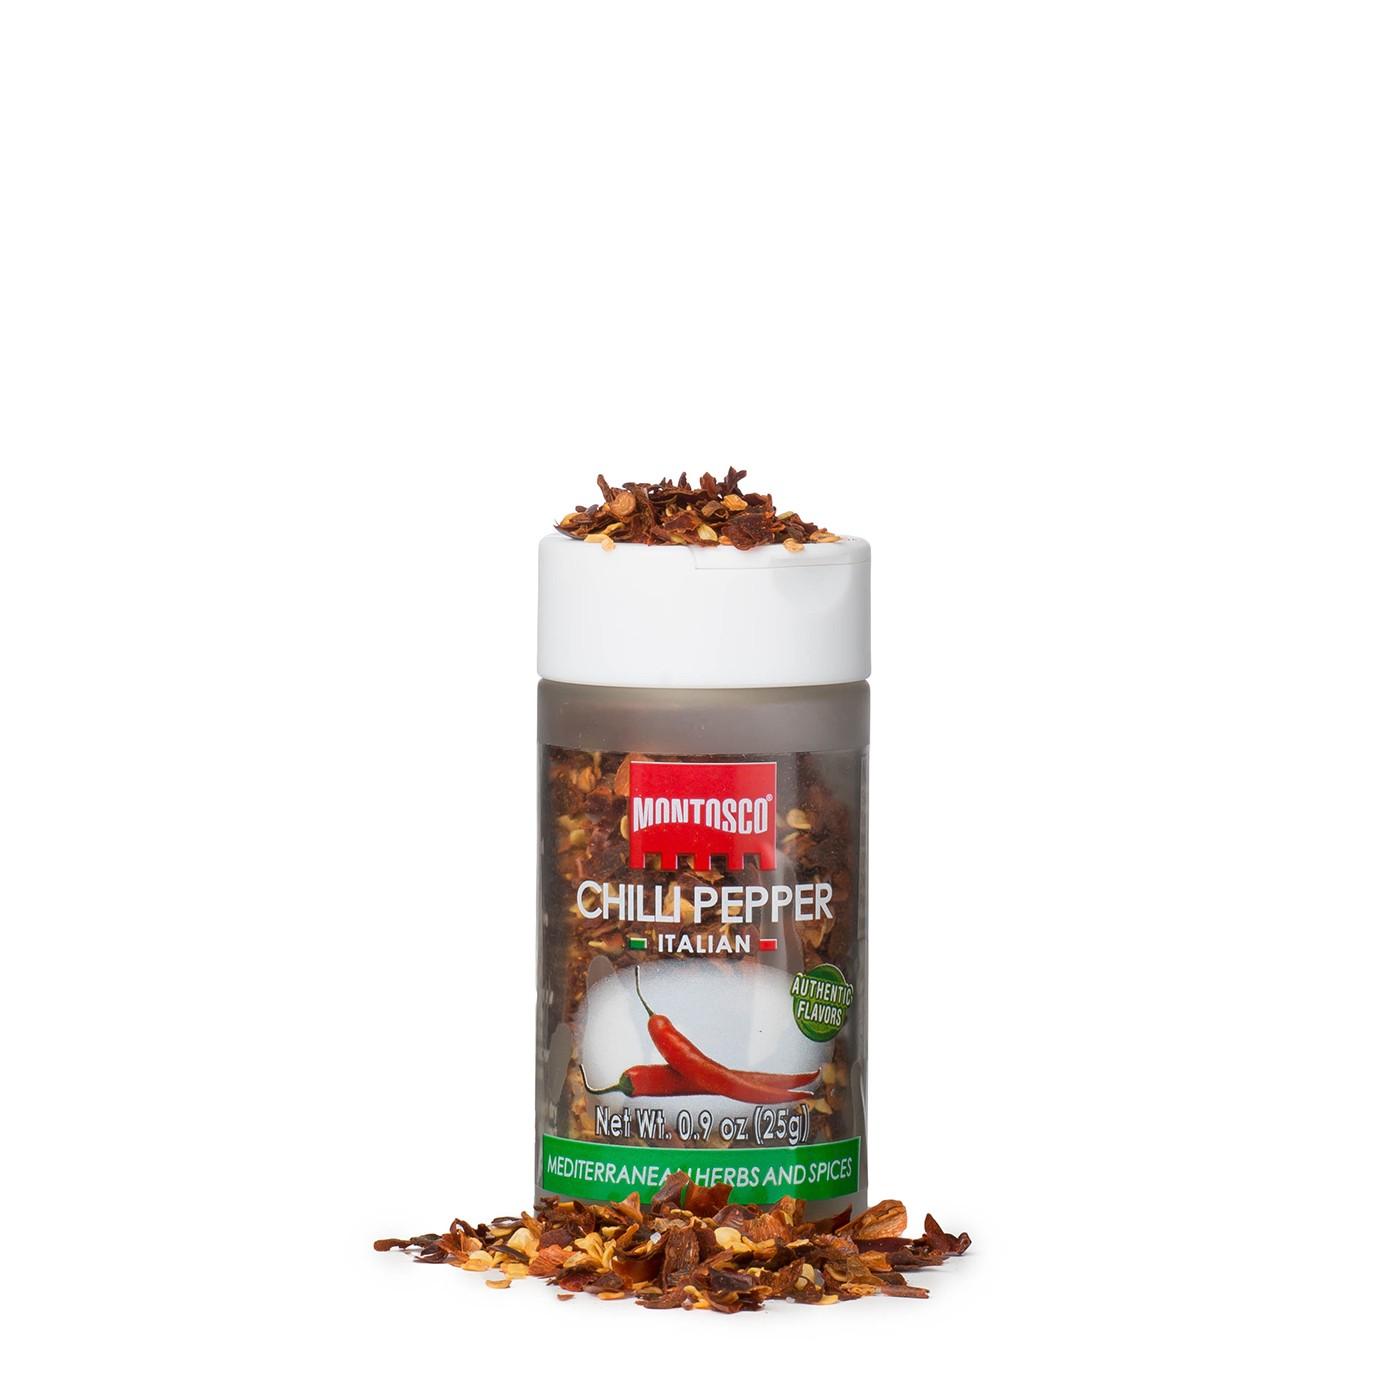 Italian Chili Pepper Flakes with Refill 0.9 oz